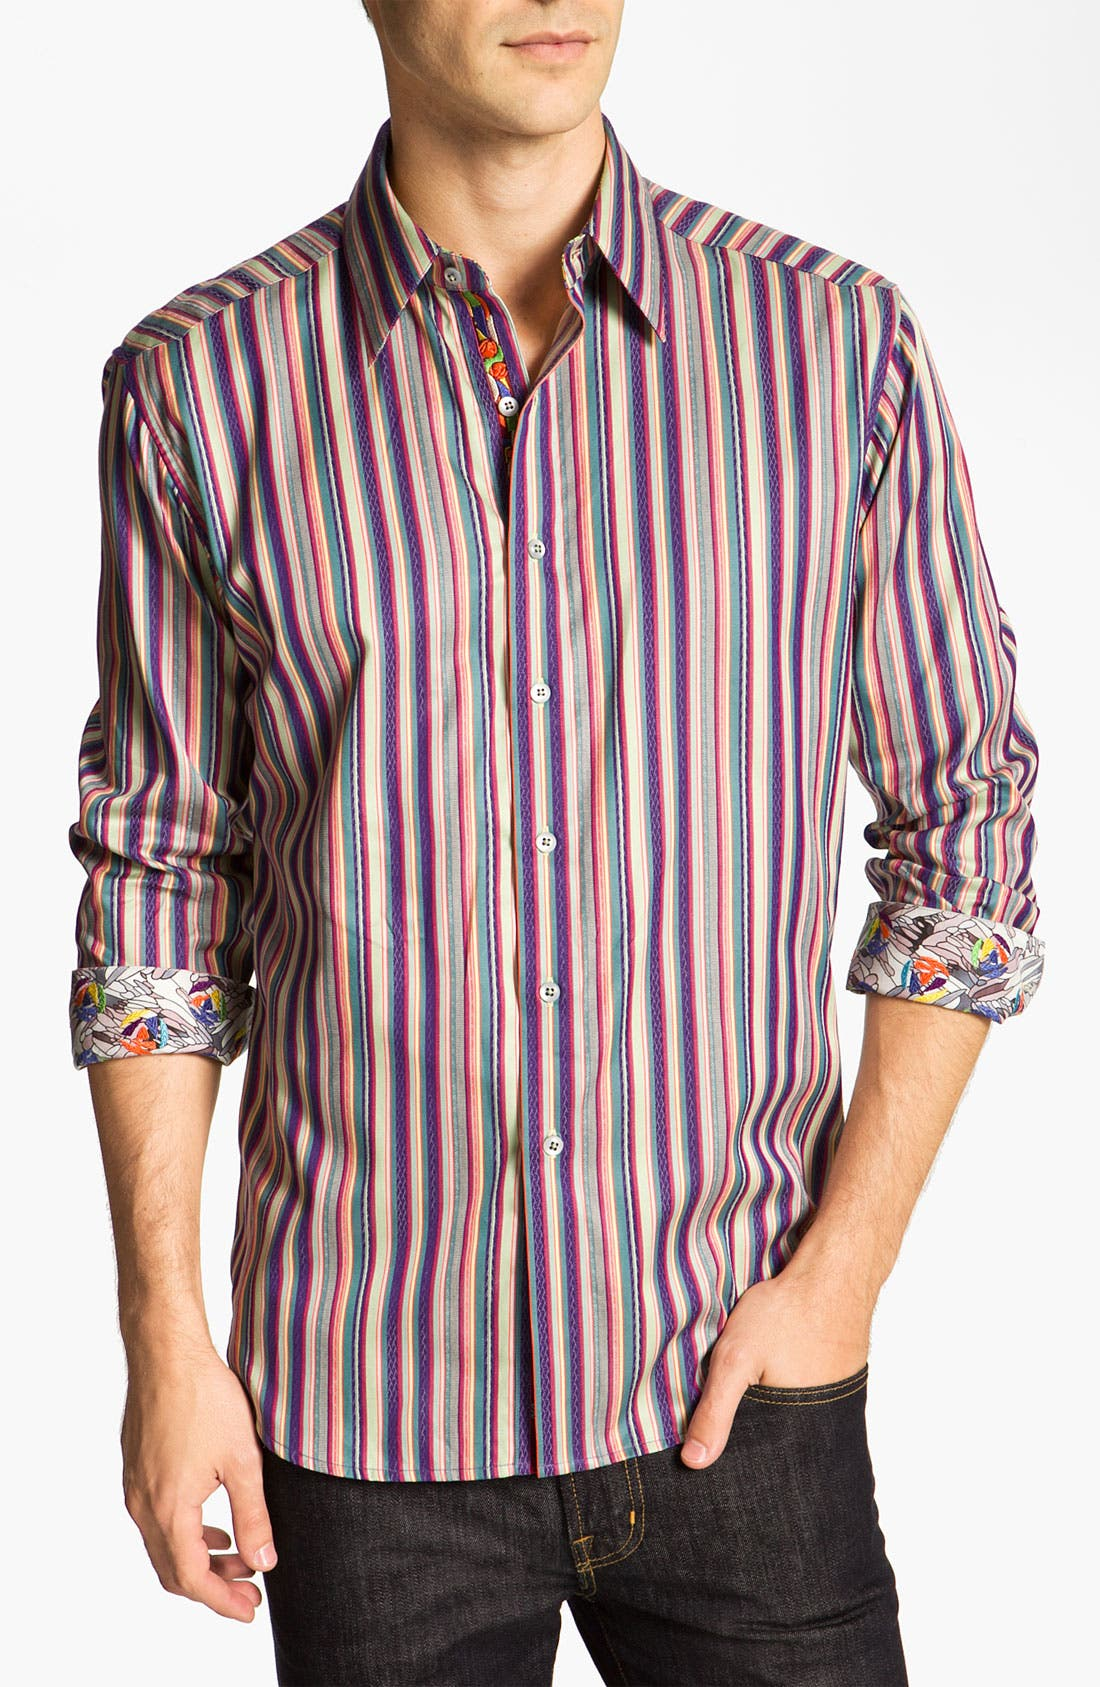 Alternate Image 1 Selected - Robert Graham 'Montaza' Sport Shirt